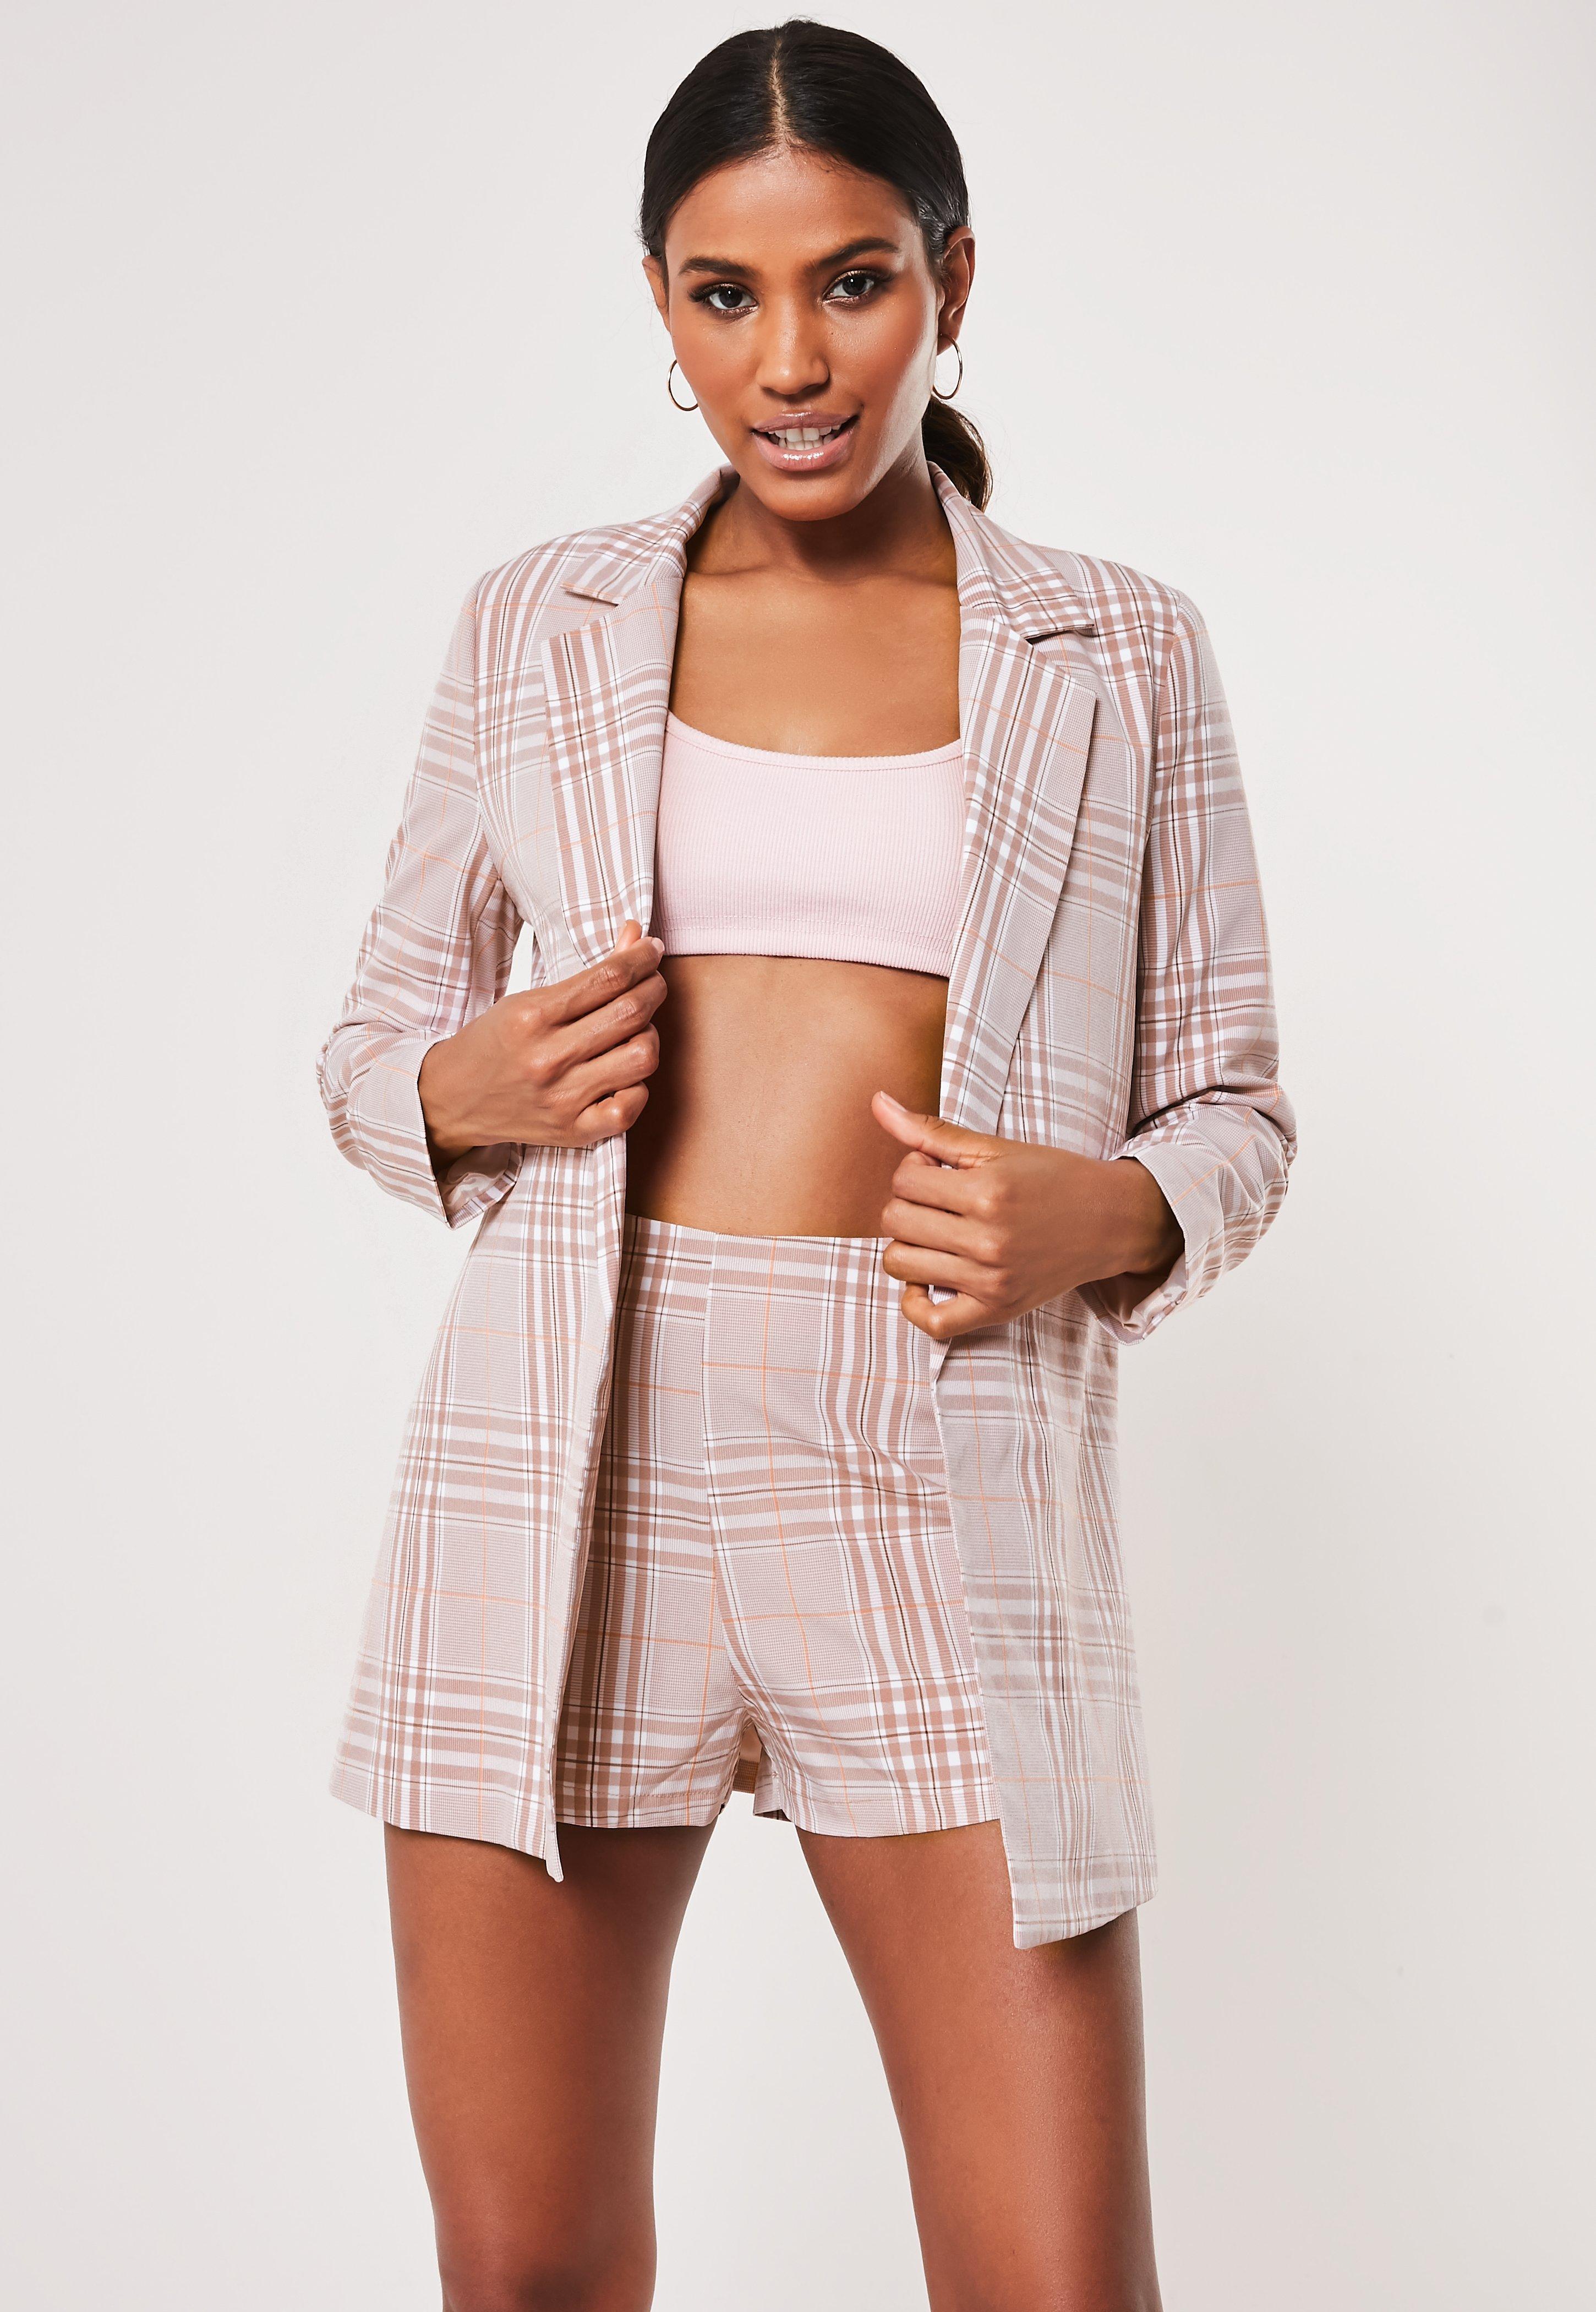 2bd97e3e7e Blazers for Women - Shop Smart & Tweed Blazers UK - Missguided